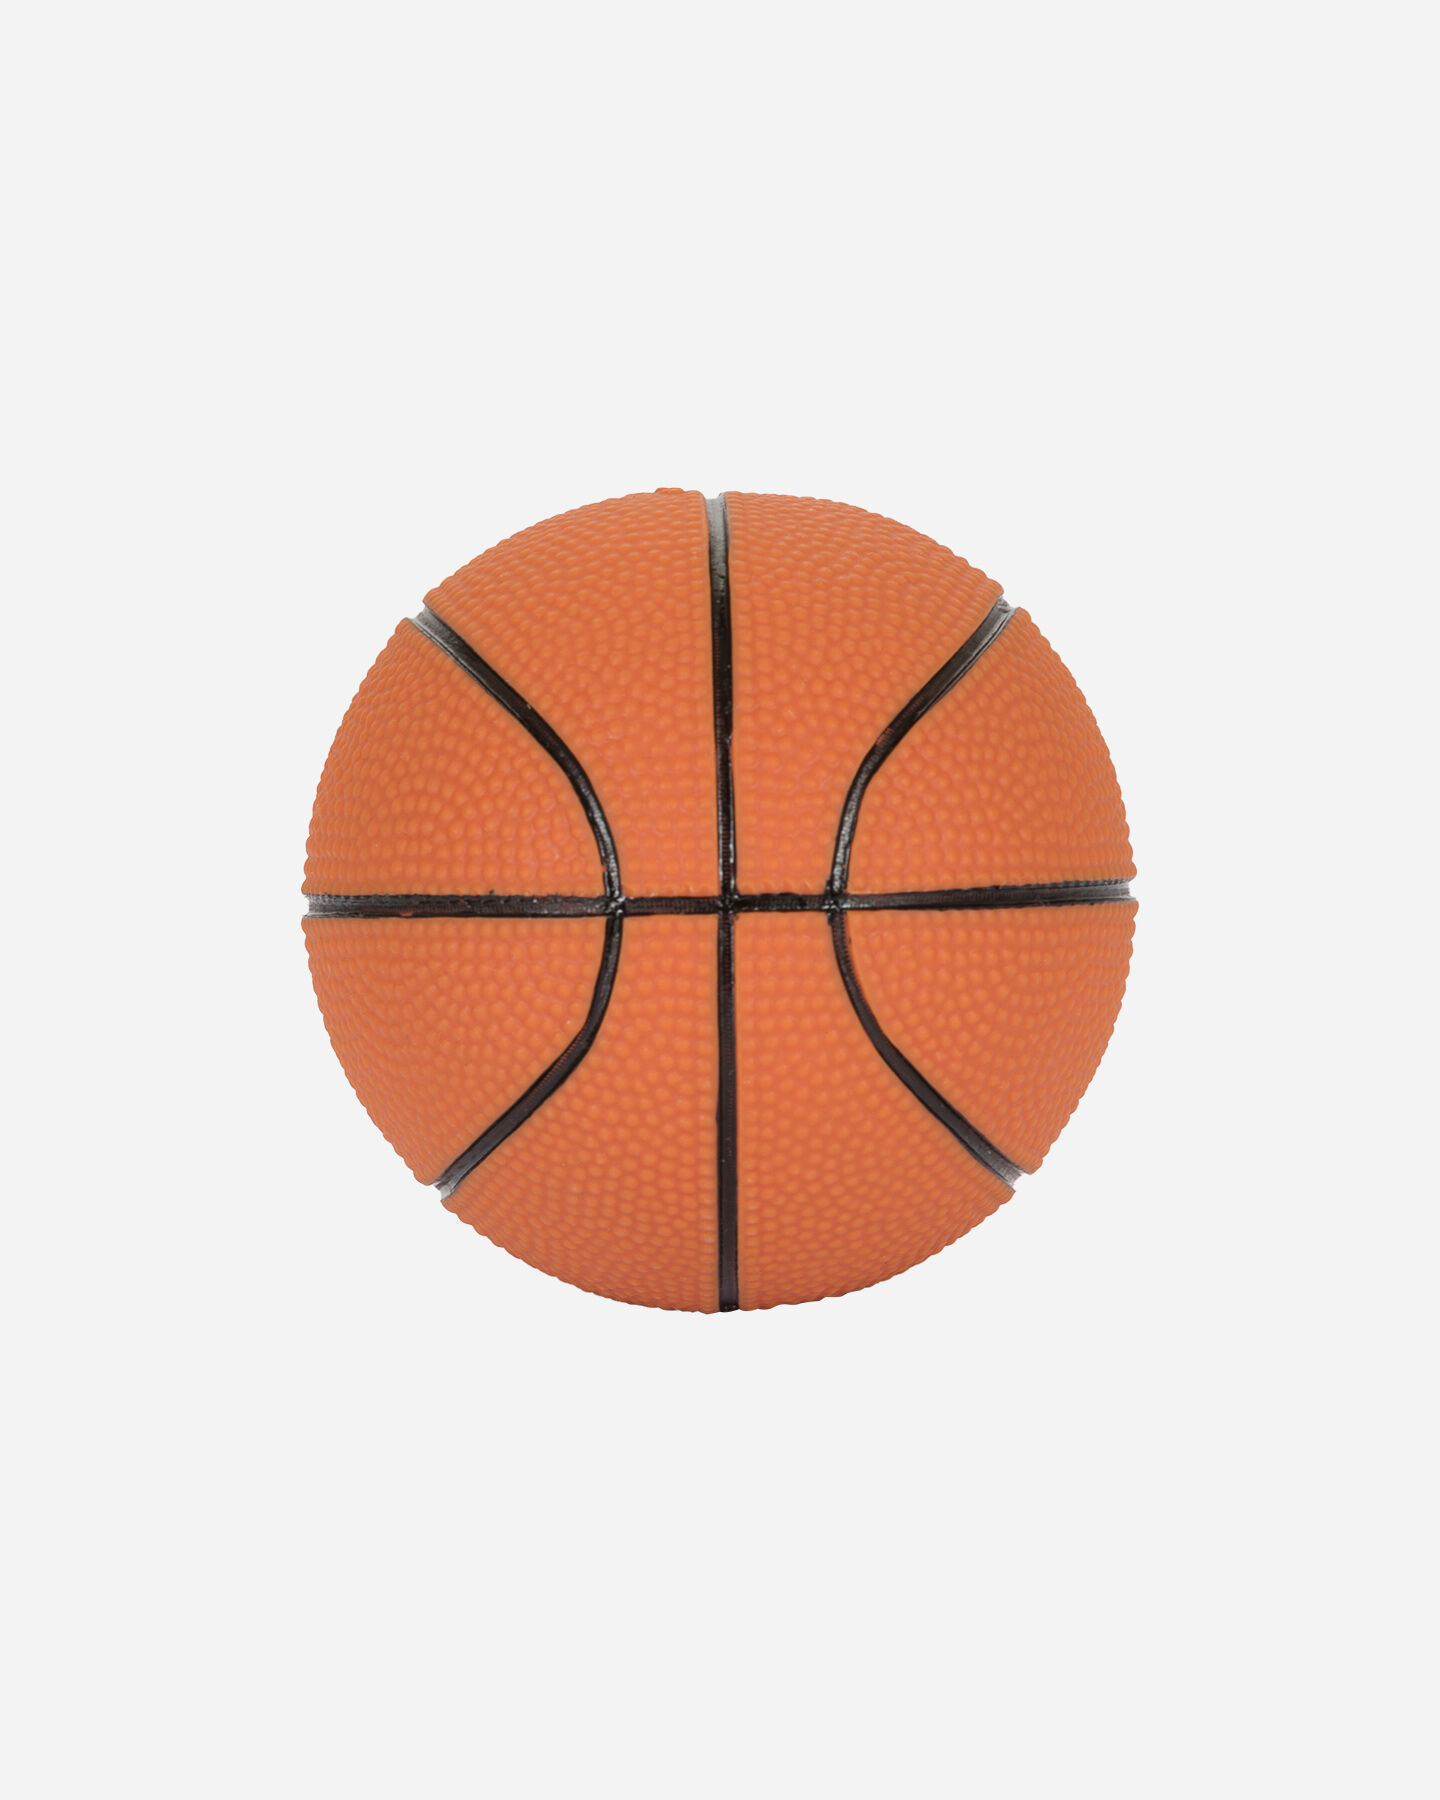 Canestro tabellone basket PRO TOUCH SET MINI BASKETBALL JR S2000104 900 - scatto 1